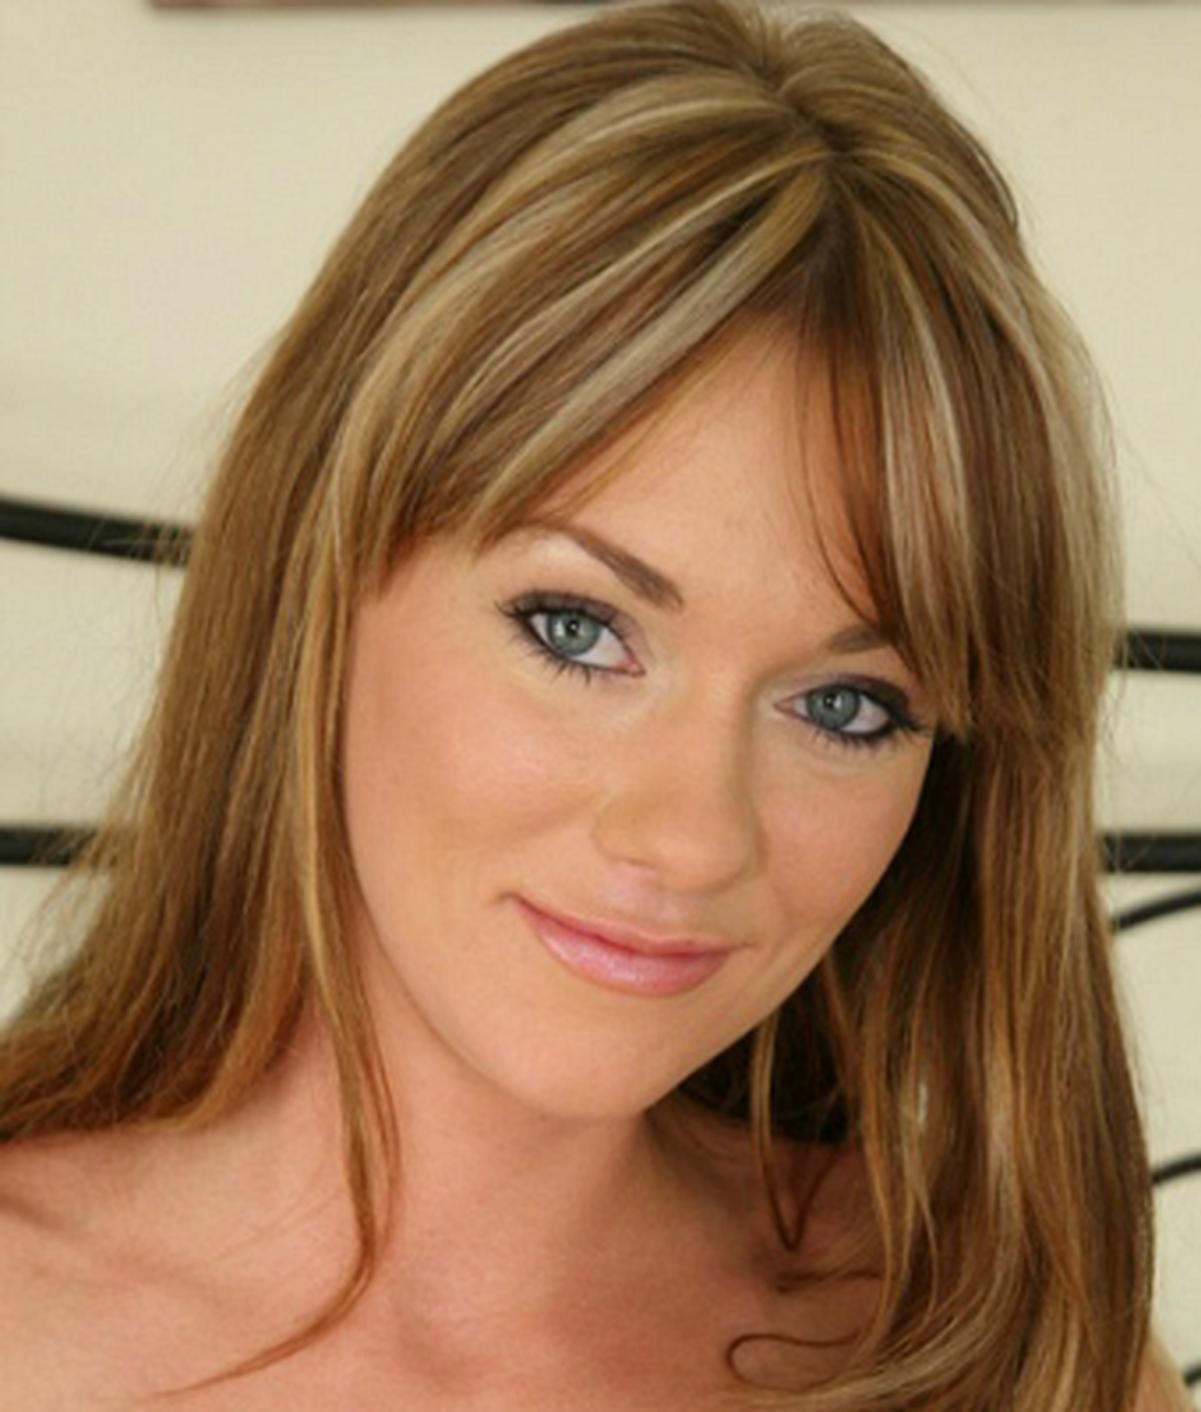 Paige Ashley wiki, Paige Ashley bio, Paige Ashley news